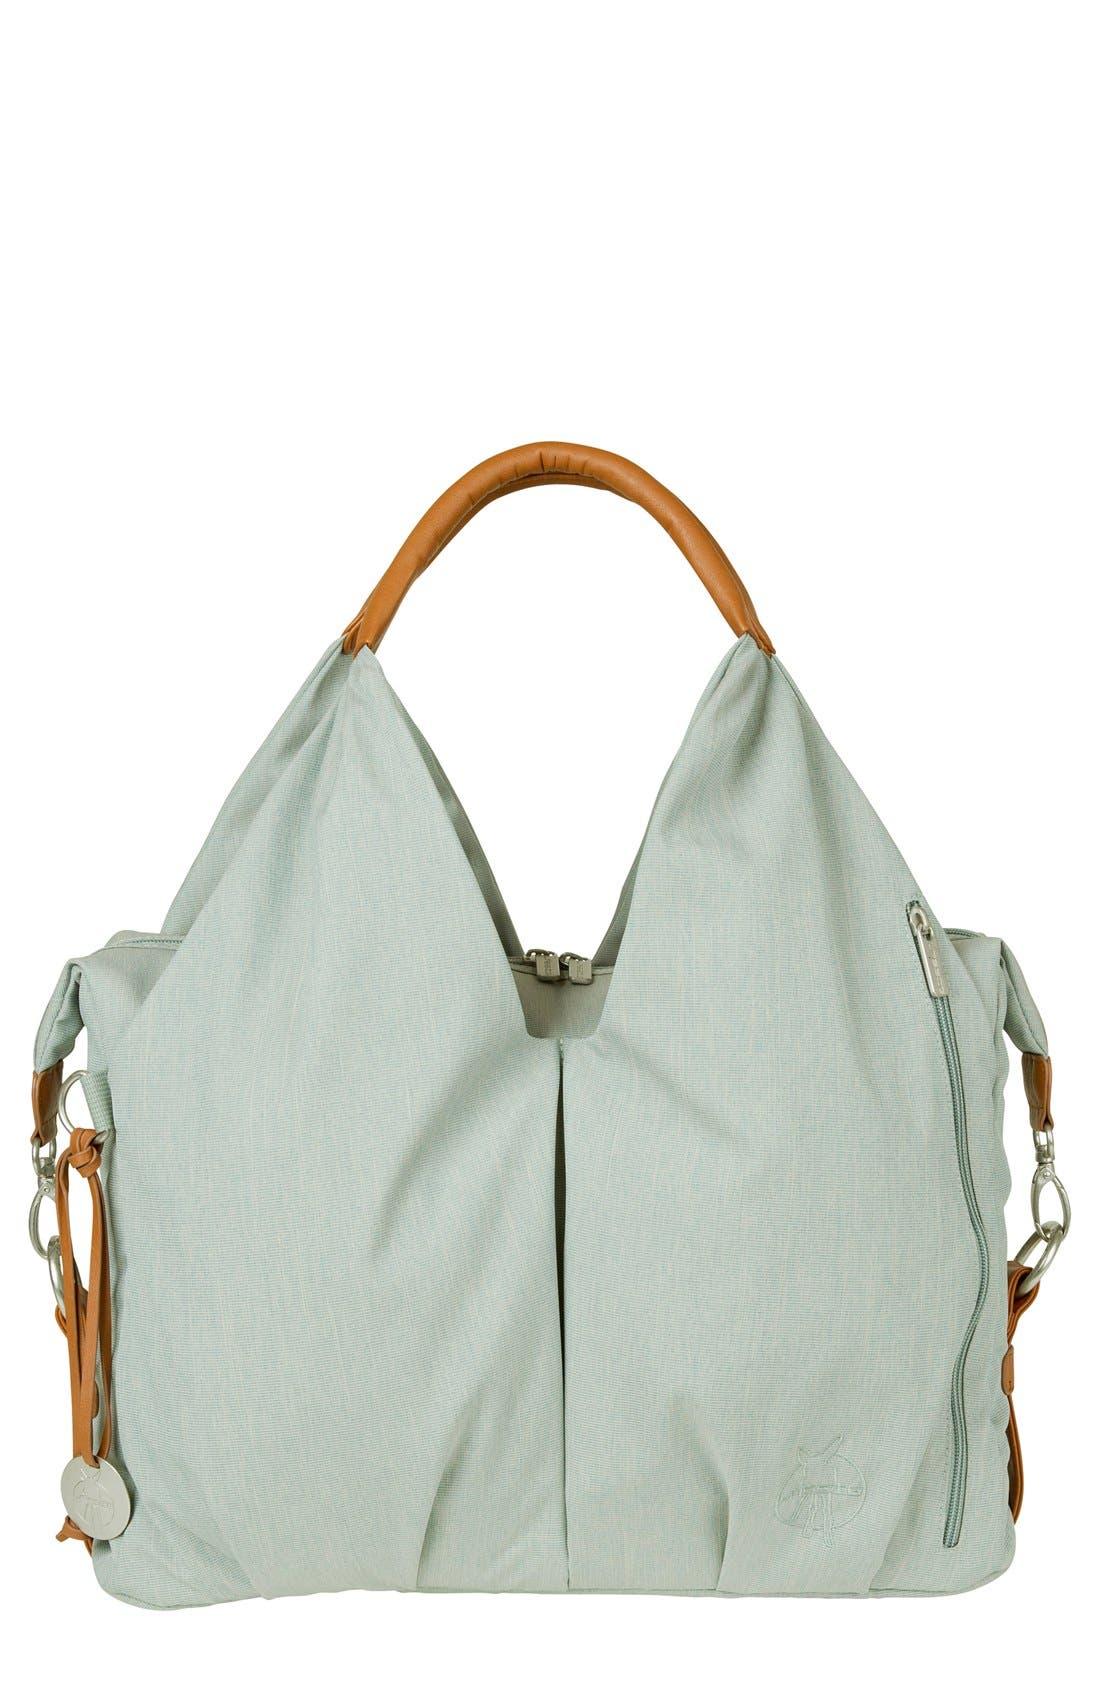 'Green Label - Neckline' Diaper Bag,                             Main thumbnail 1, color,                             SKY BLUE/ BROWN